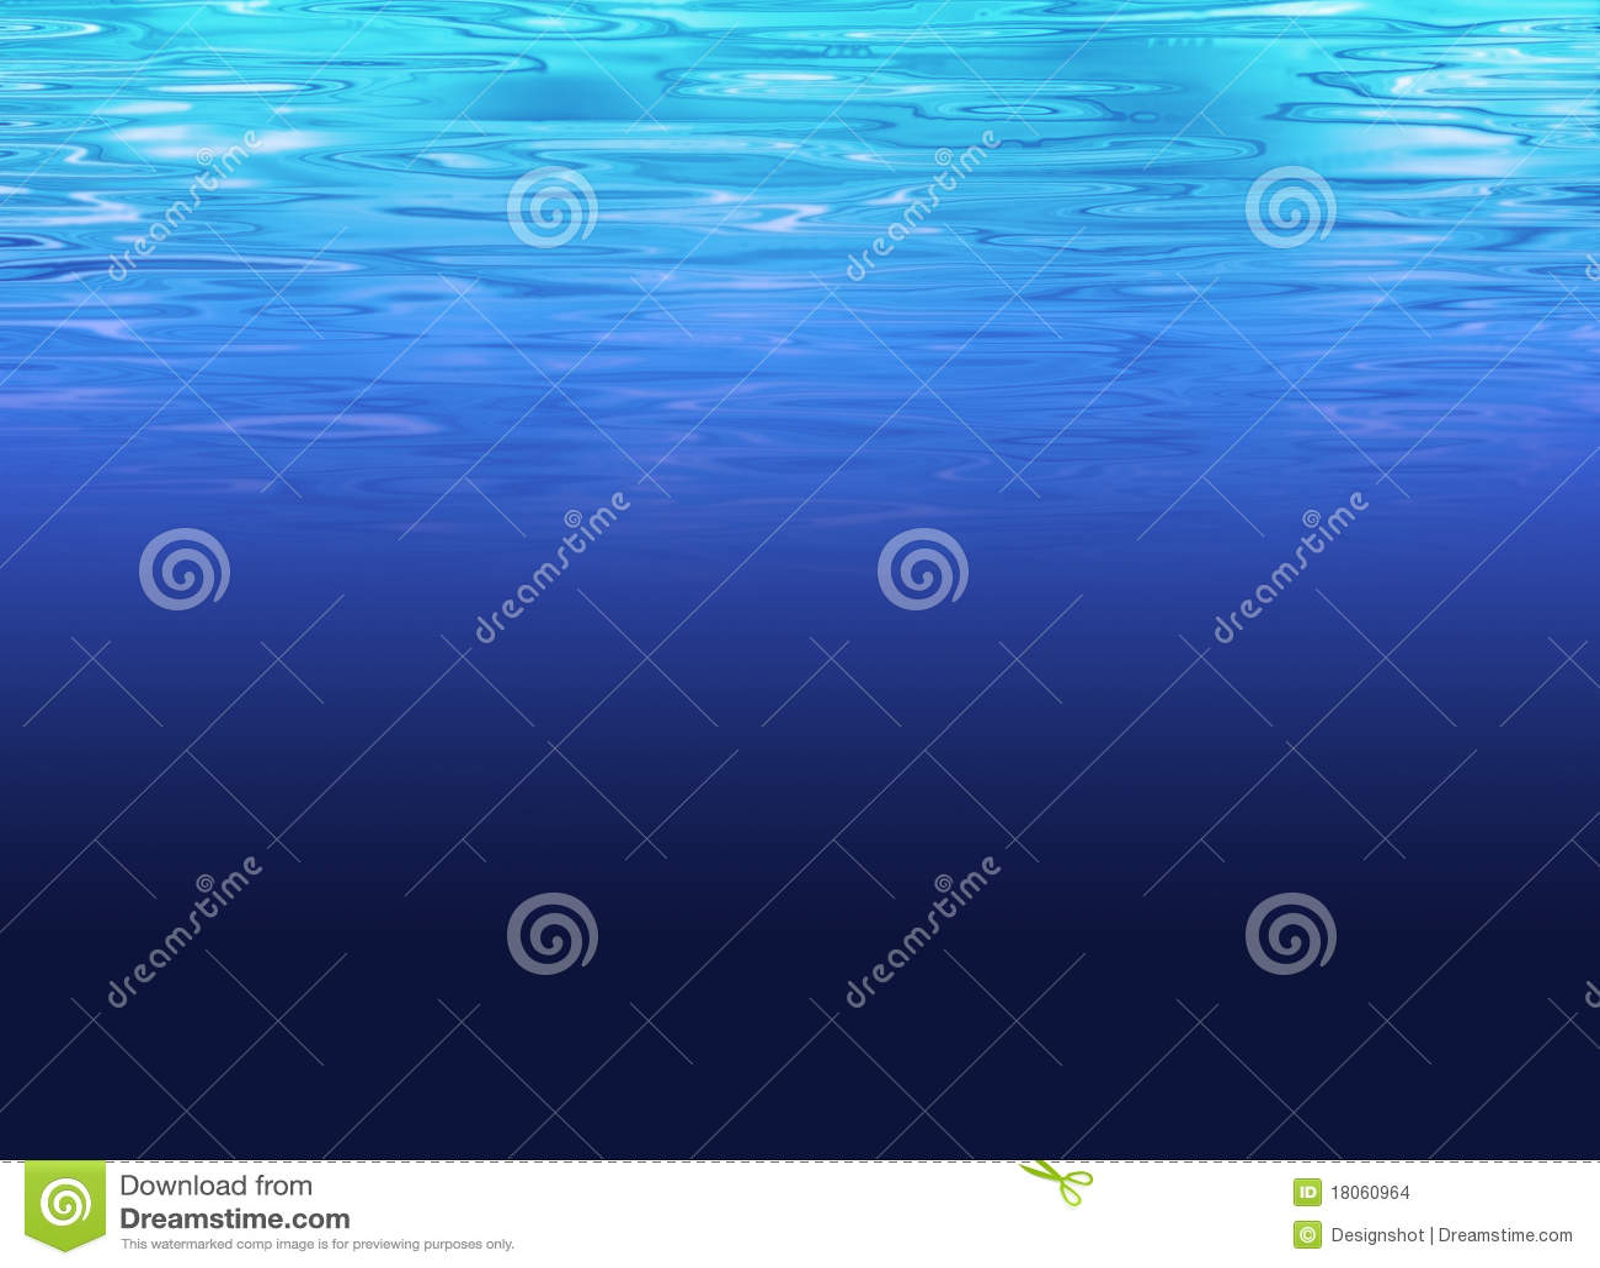 Limpe o fundo do mar profundo - água azul desobstruída